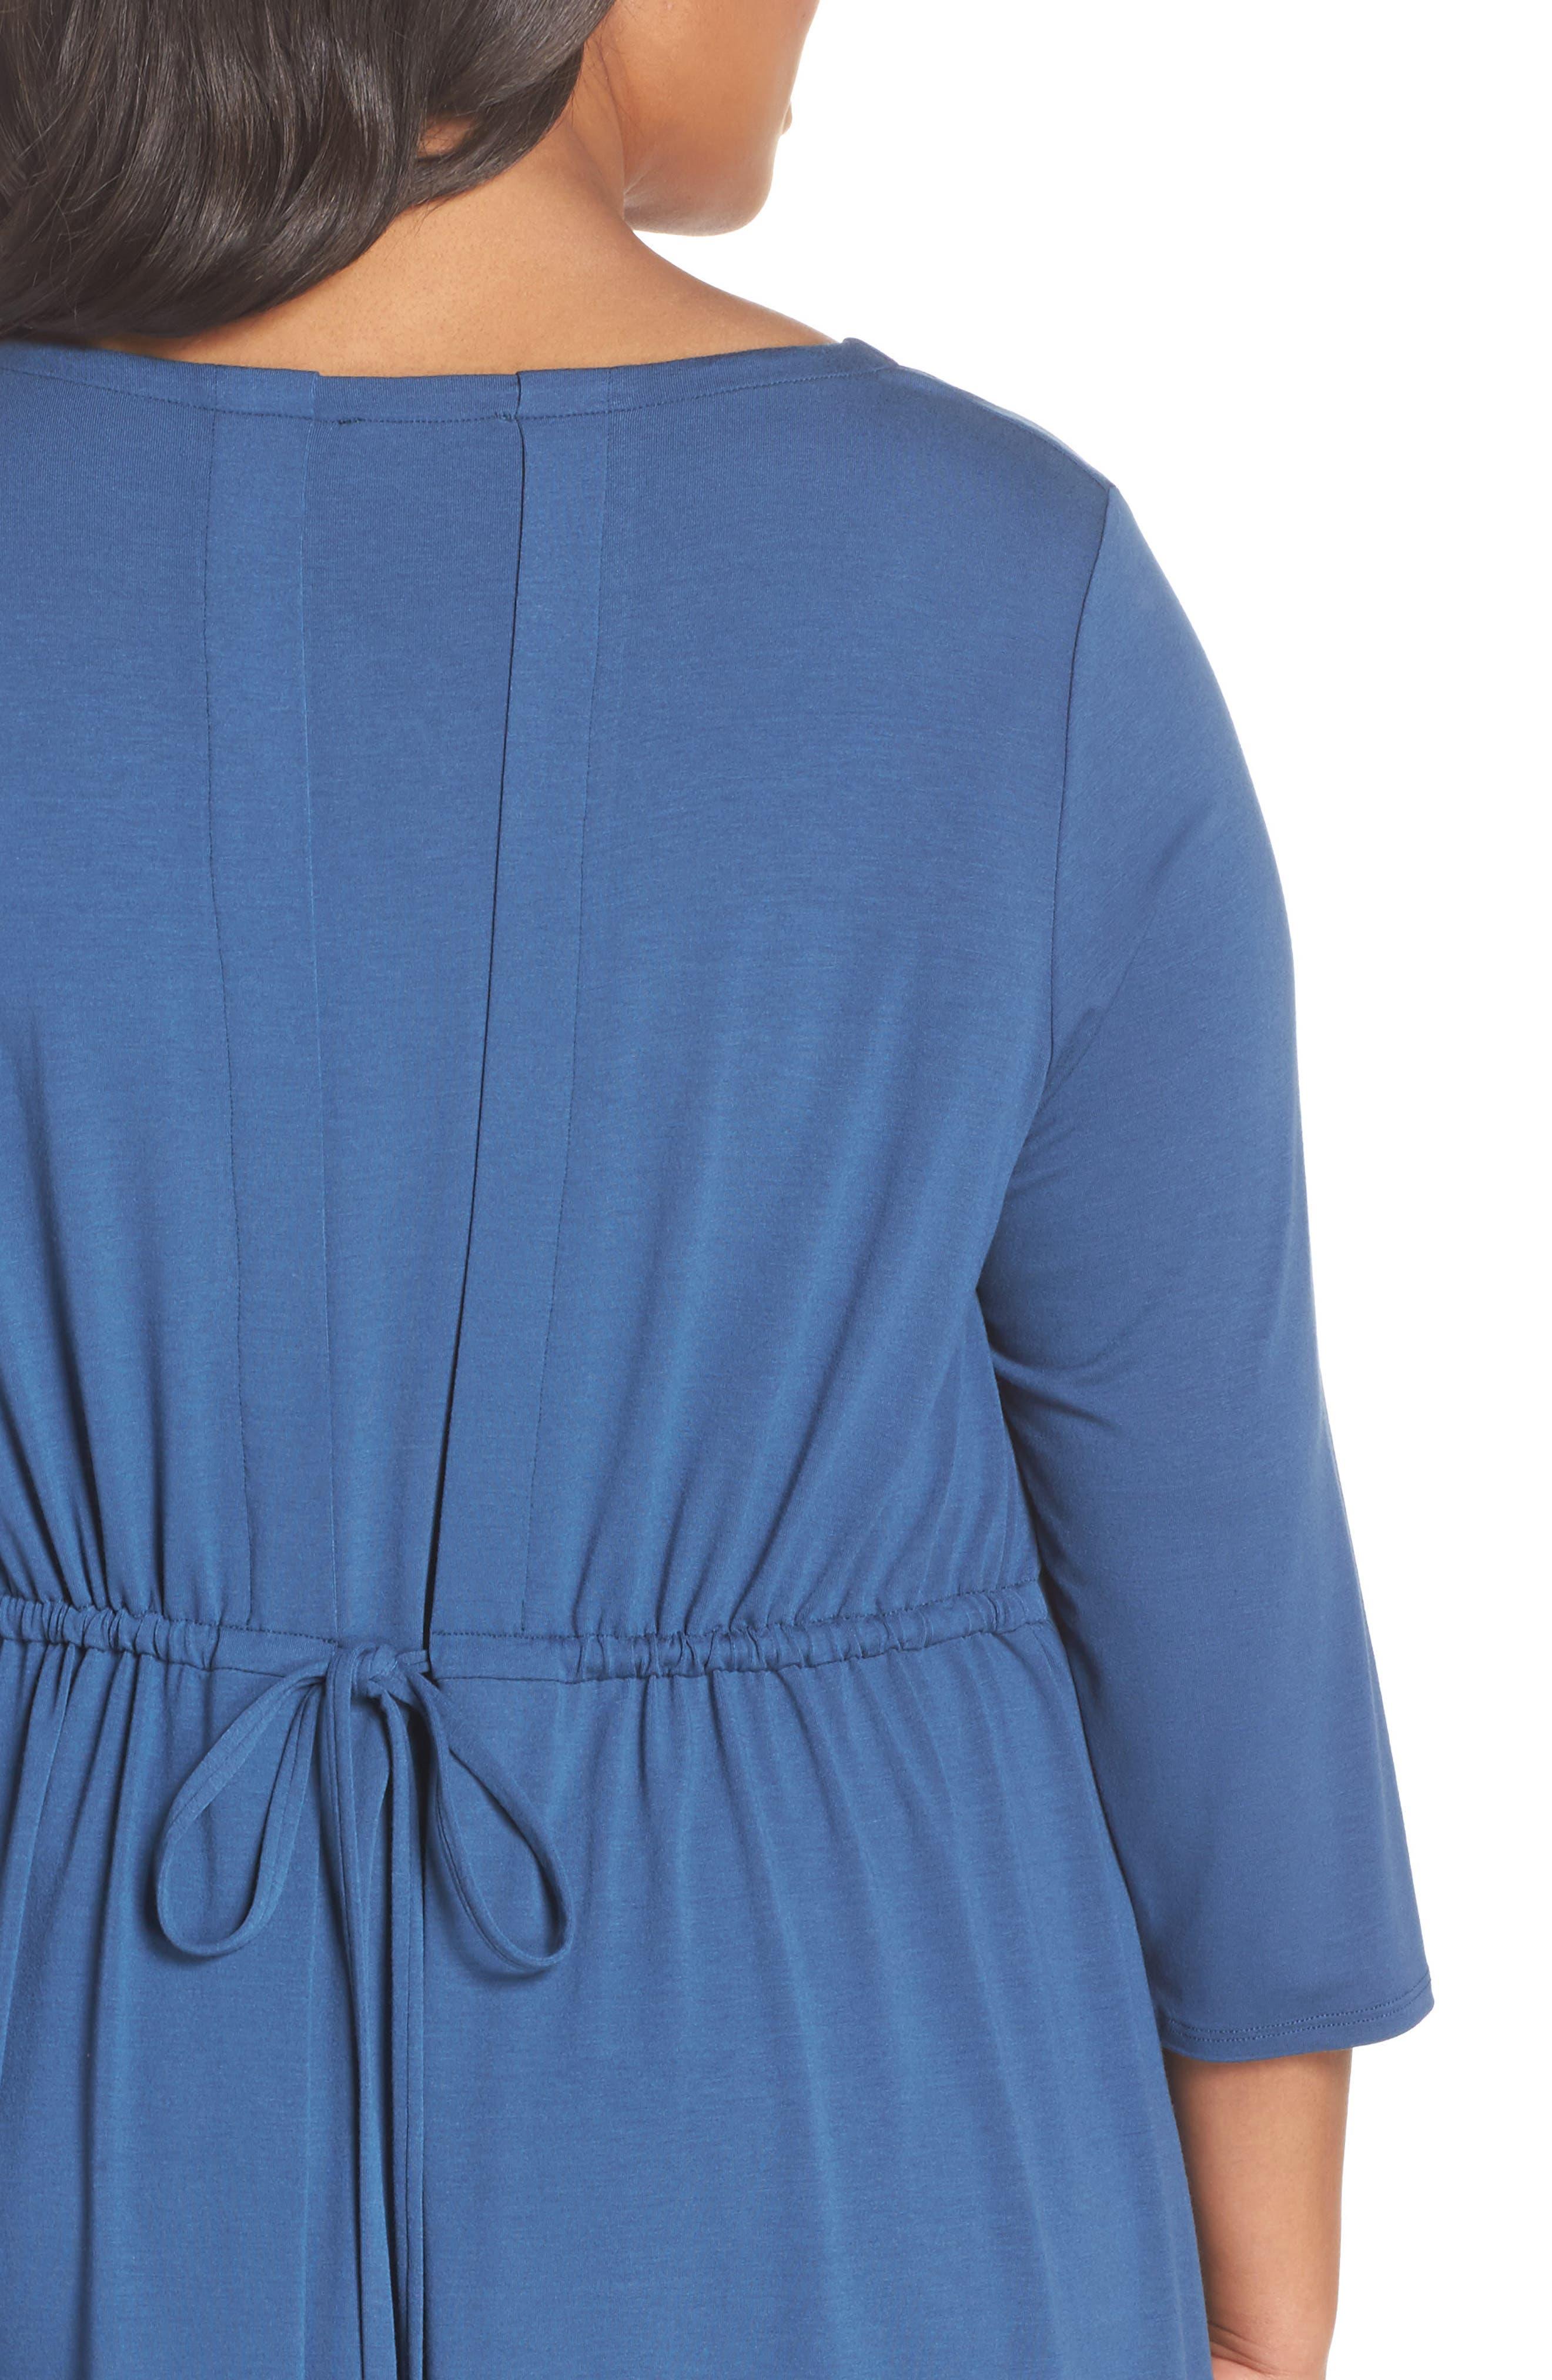 Jewel Neck Tie Back Dress,                             Alternate thumbnail 20, color,